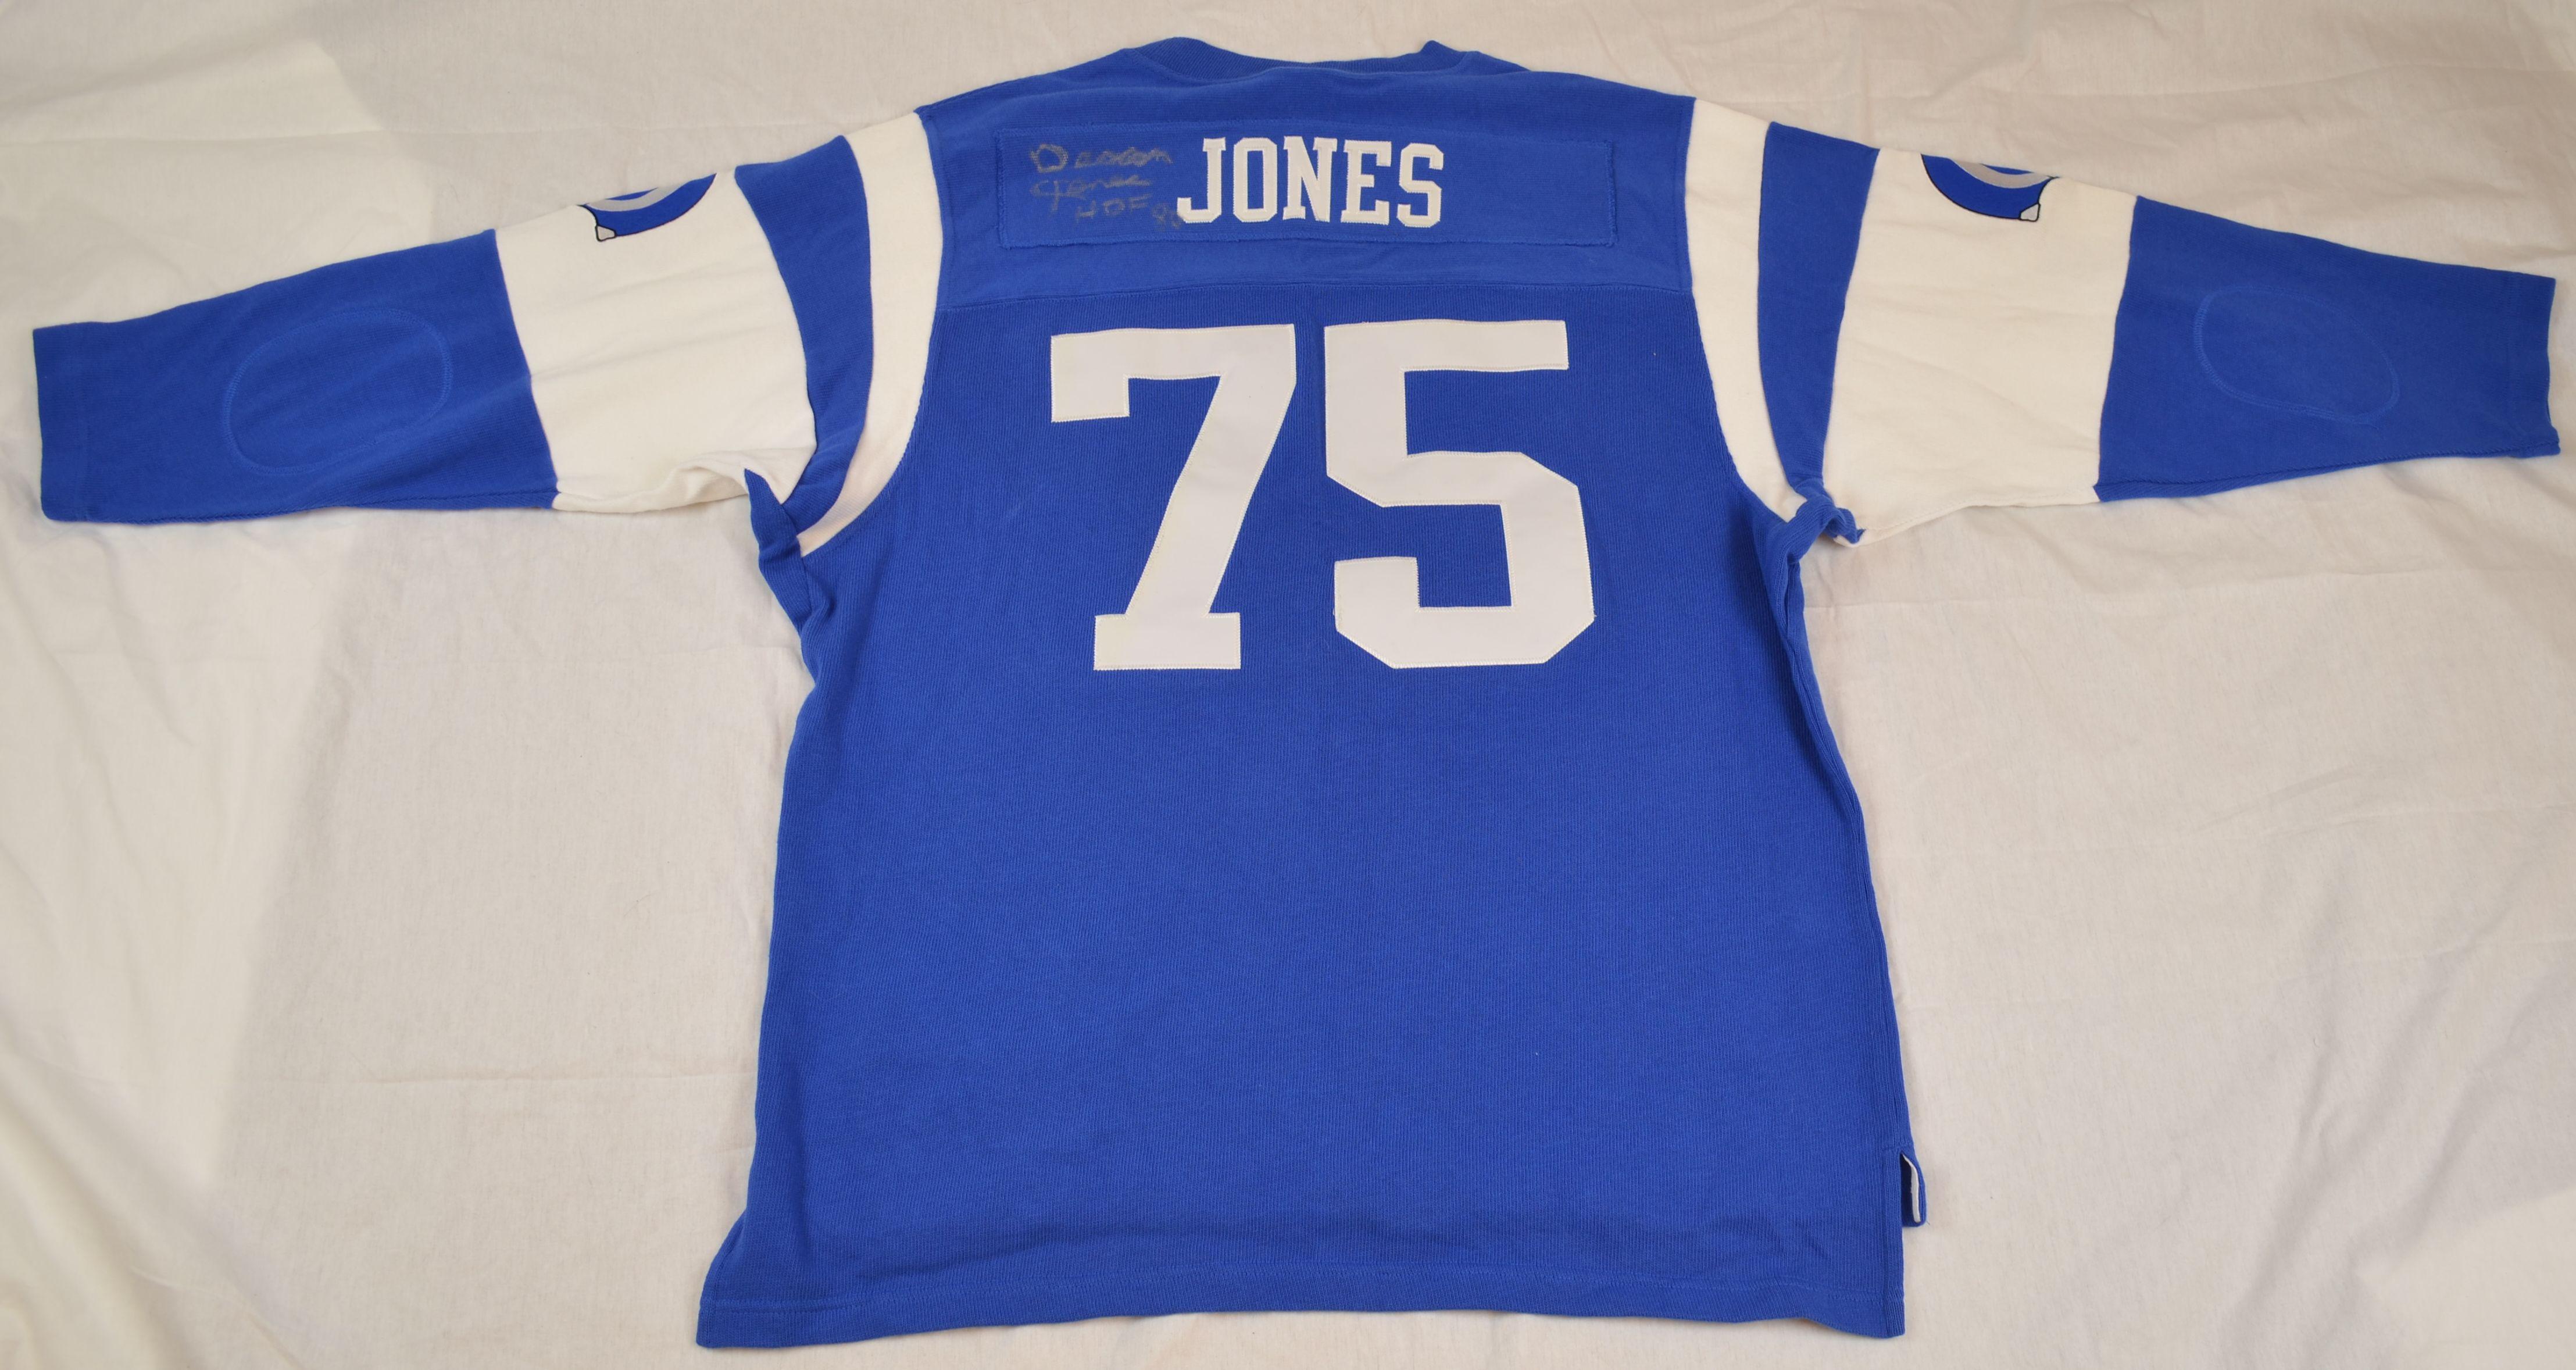 6f92716c886 Lot Detail - Deacon Jones L.A. Rams Blue NFL Throwback Jersey ...